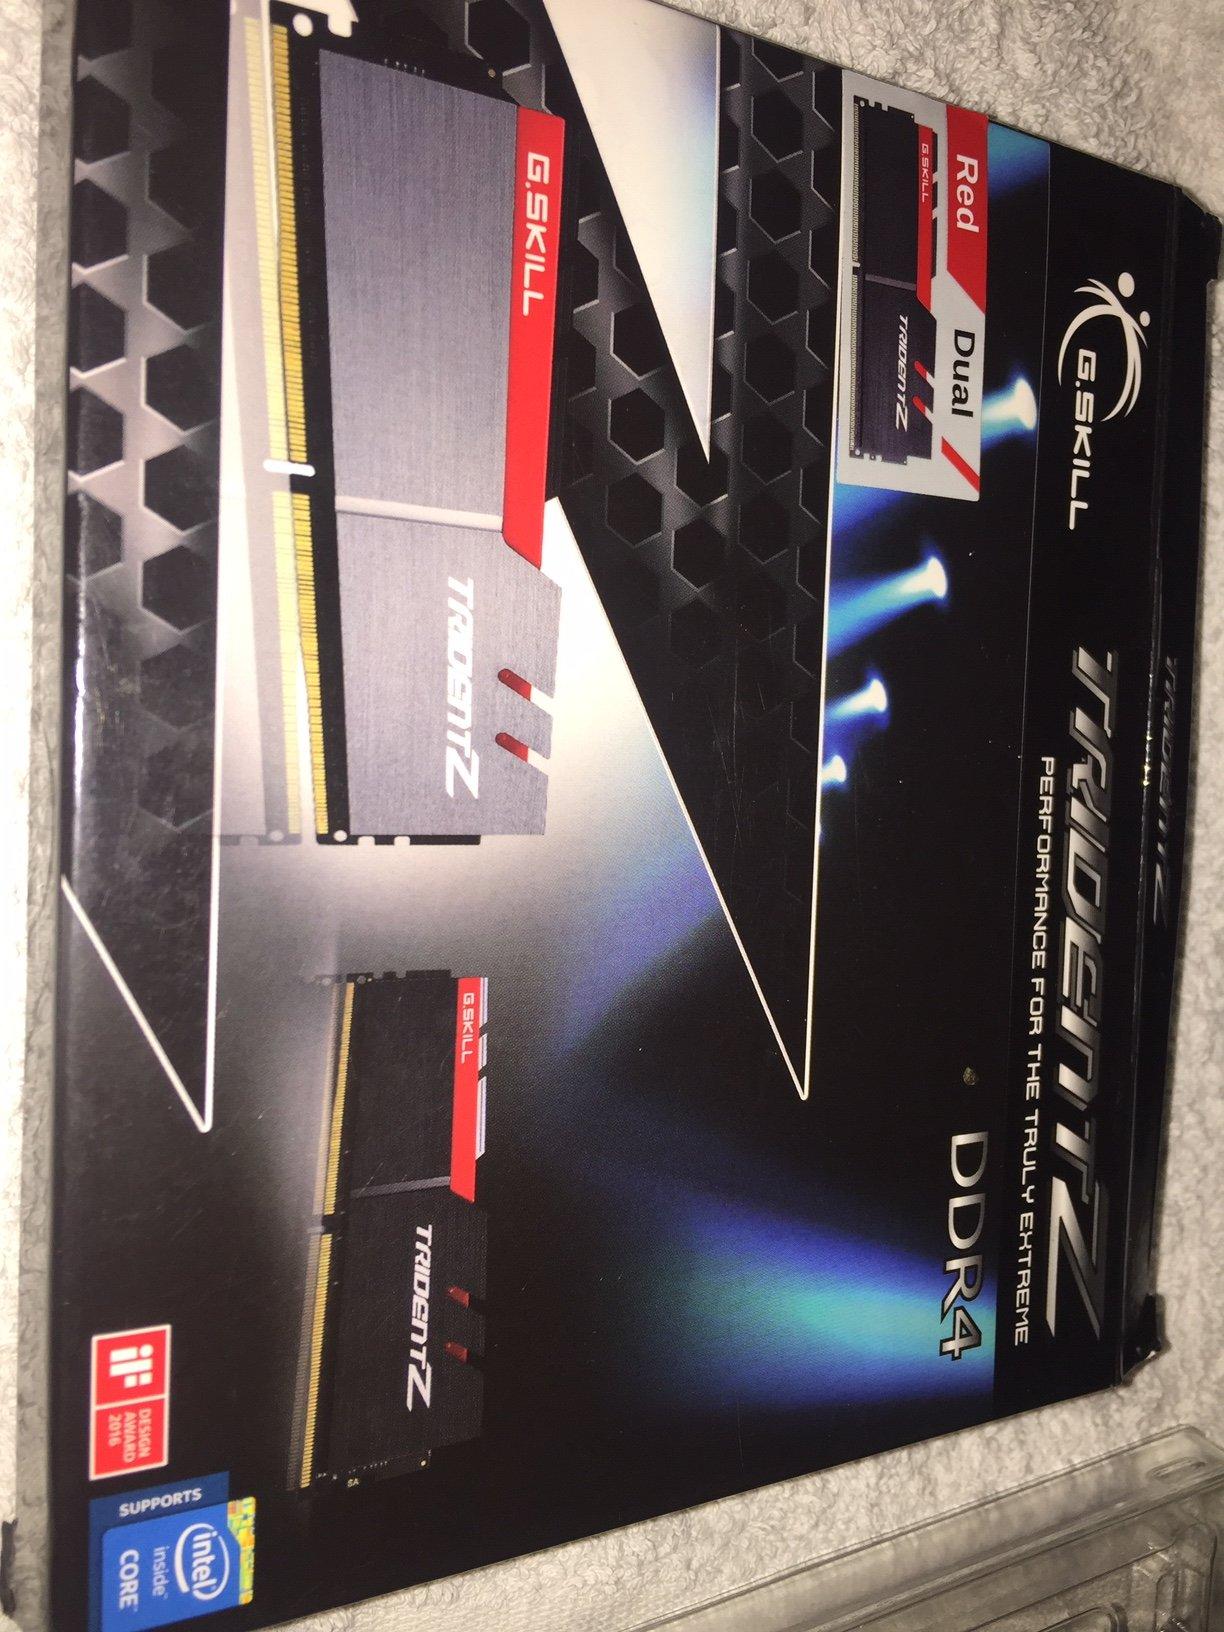 G Skill Trident Z Ram - DDR4 2 x 8 gig (16Gb) 3200 hz CL16 Black grey red